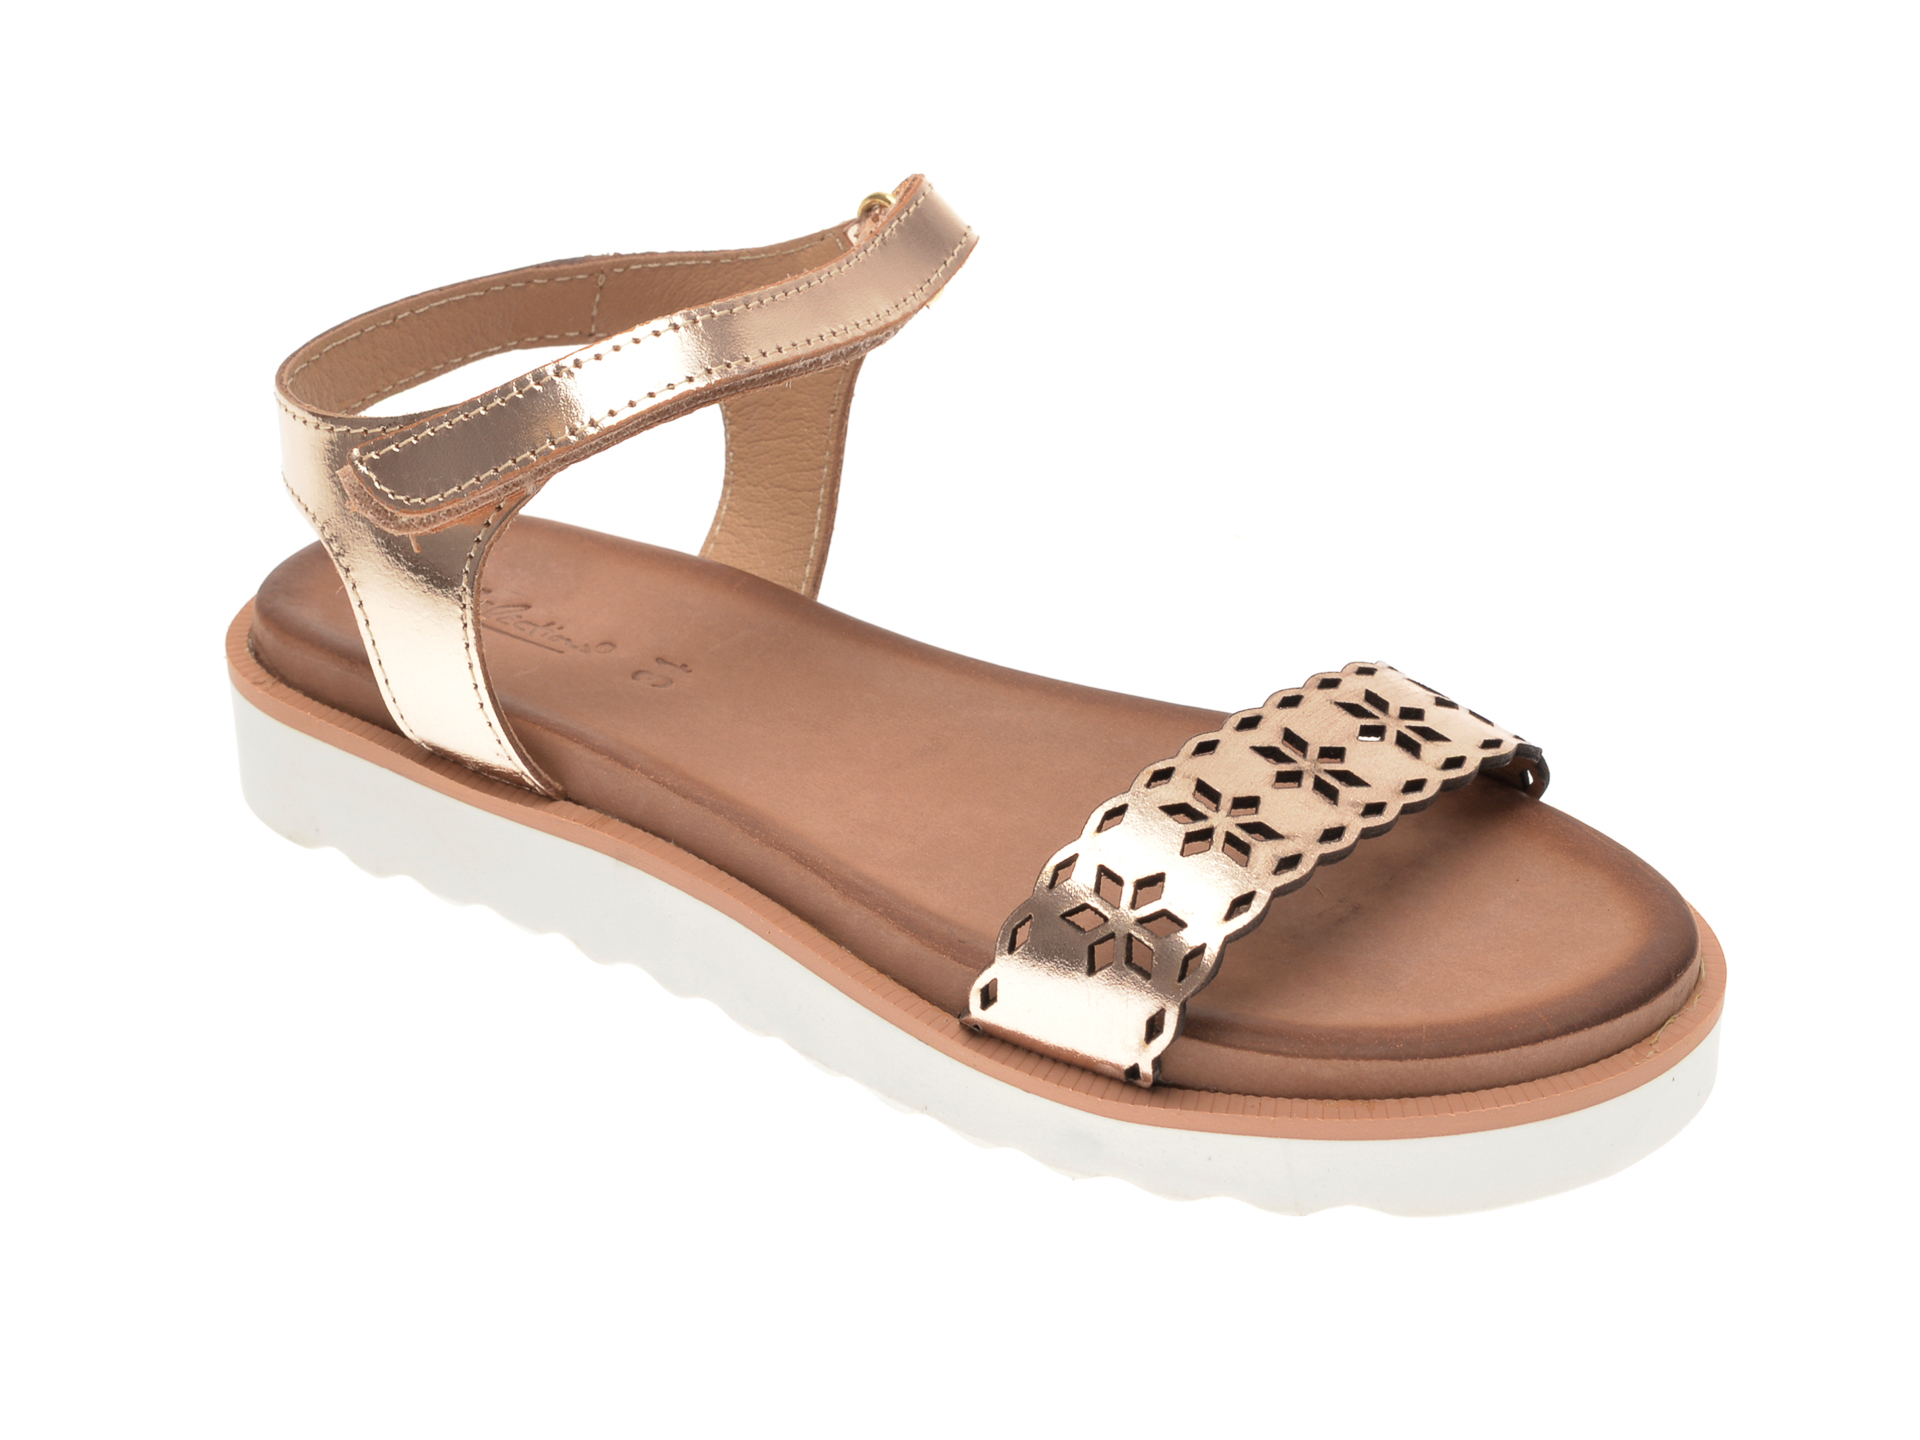 Sandale SELECTION KIDS aurii, SH17, din piele naturala